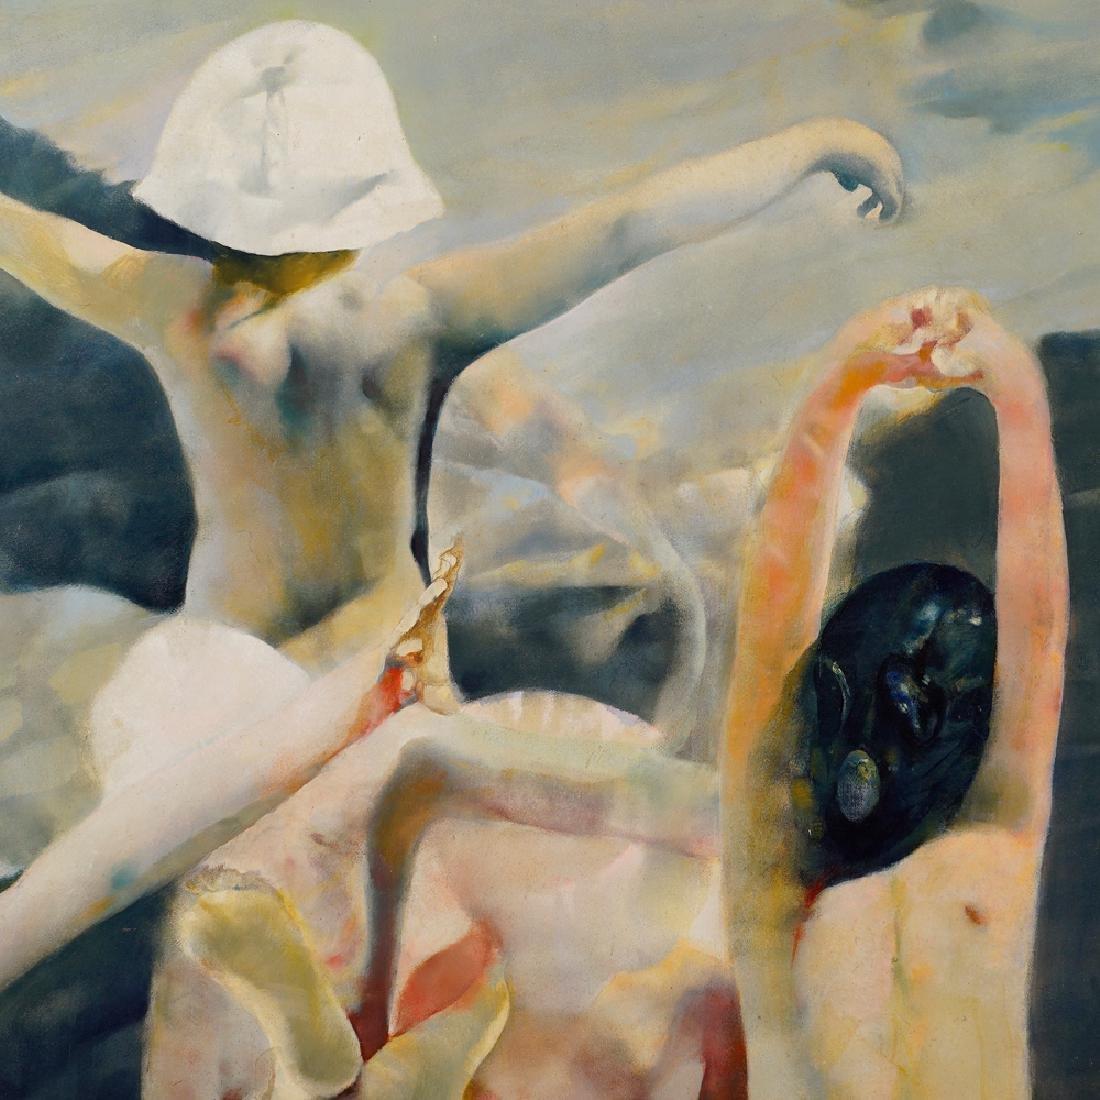 Renzo Vespignani Roma 1924 - 2001 170x195 cm. - 2